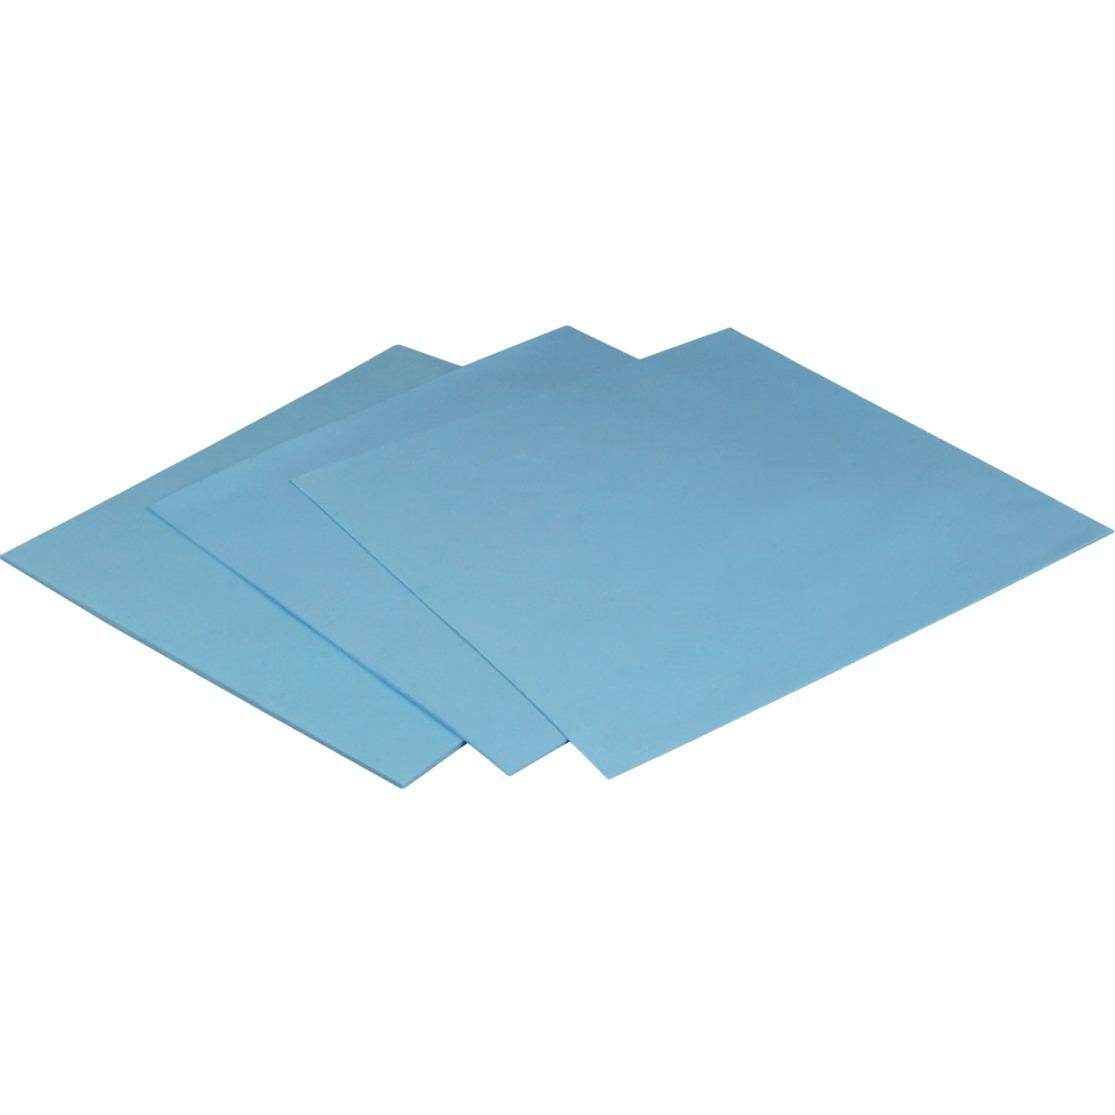 ACTPD00003A Azul hardware accesorio de refrigeración, Conductores térmicos (grasa/disco)